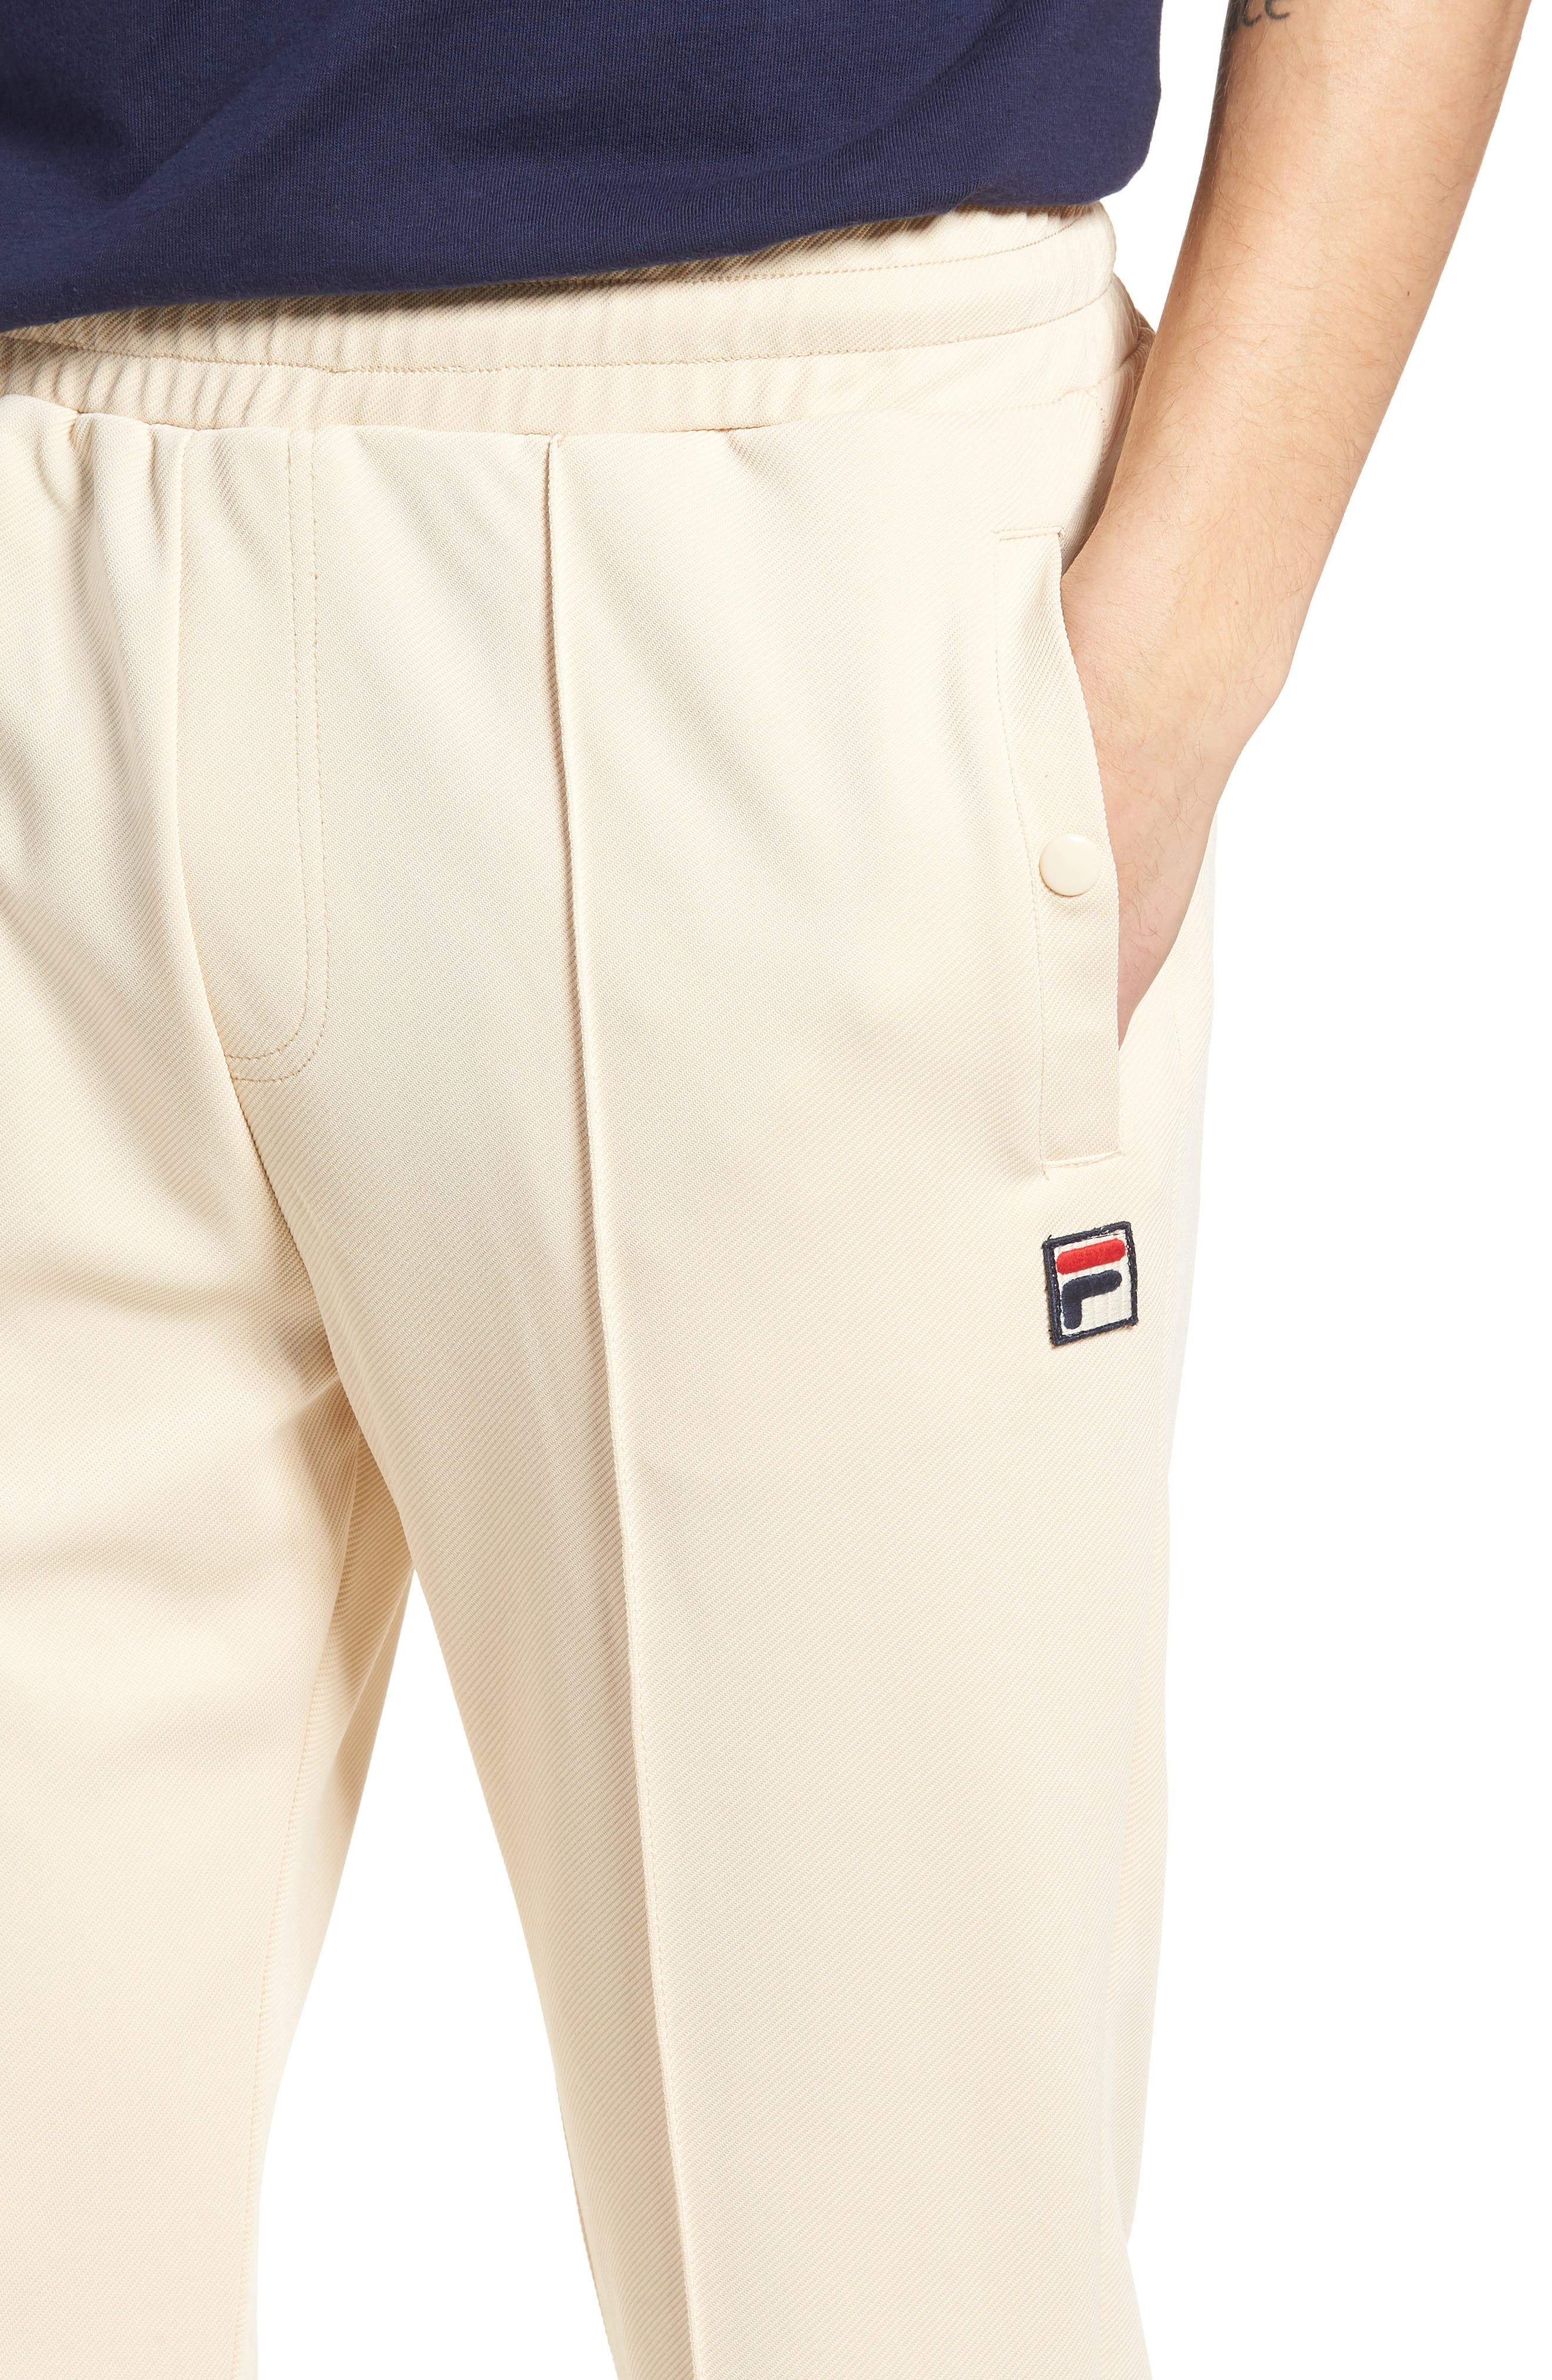 Molveno 2 Pants,                             Alternate thumbnail 4, color,                             250